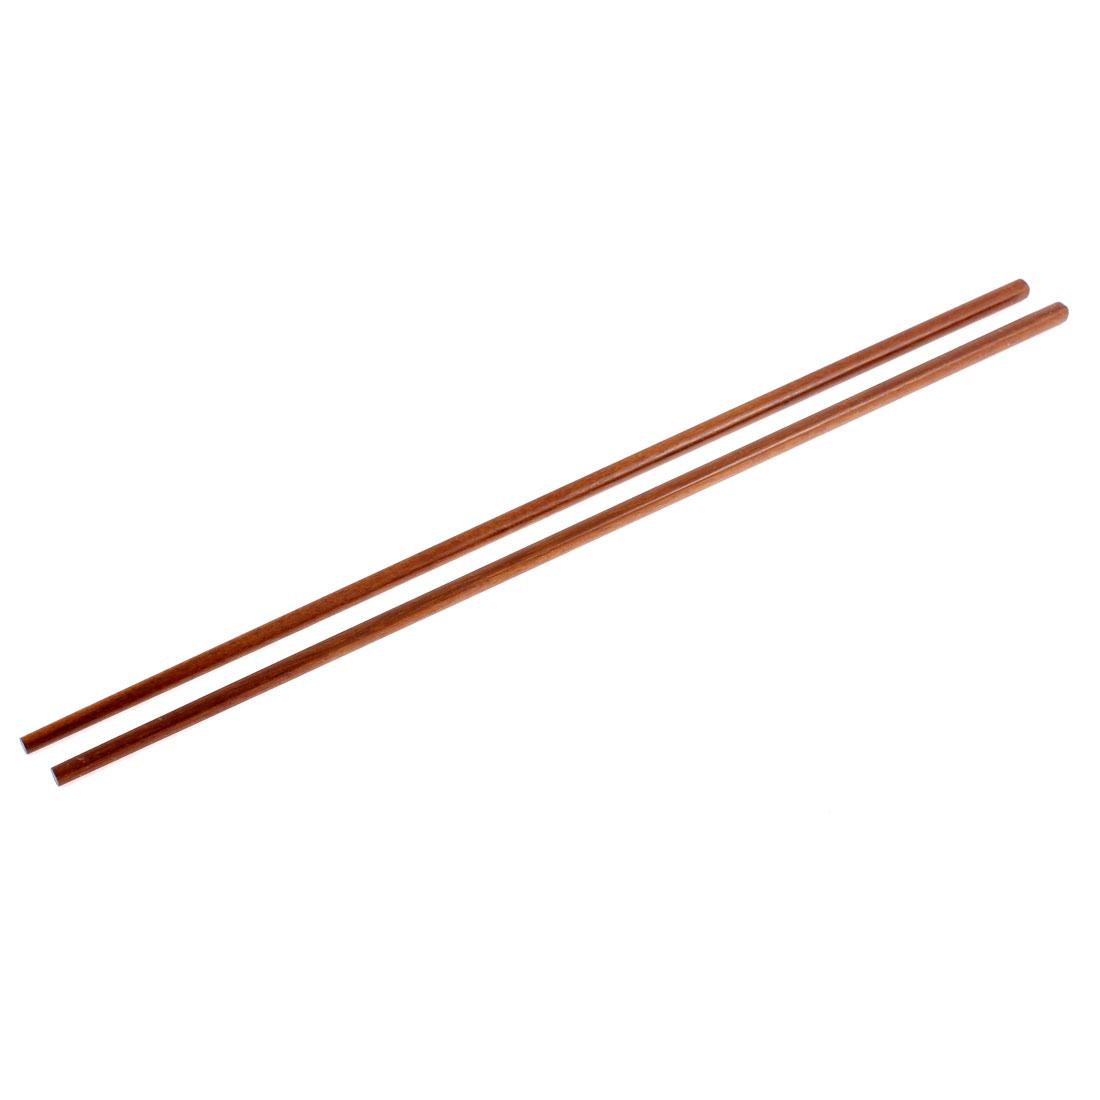 Kitchen Noodles Cooking Wooden Chopsticks 42cm Length Brown Pair